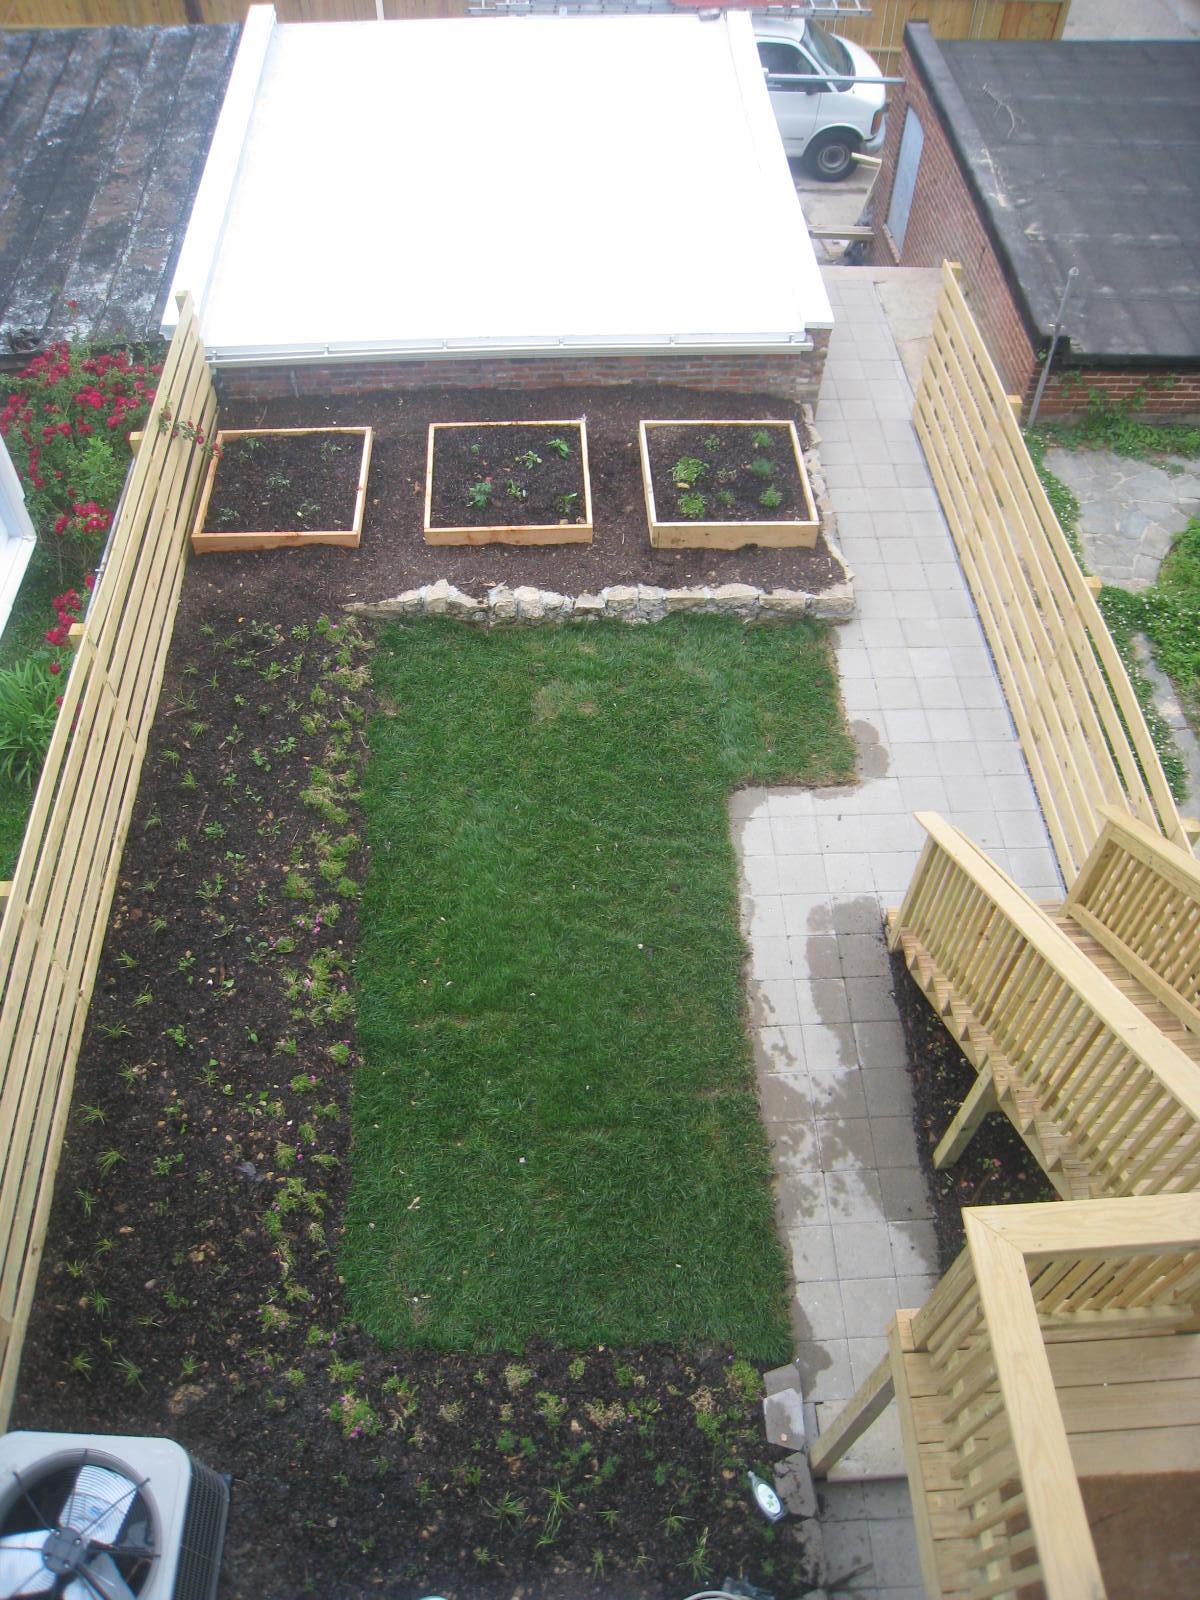 The backyard and garage